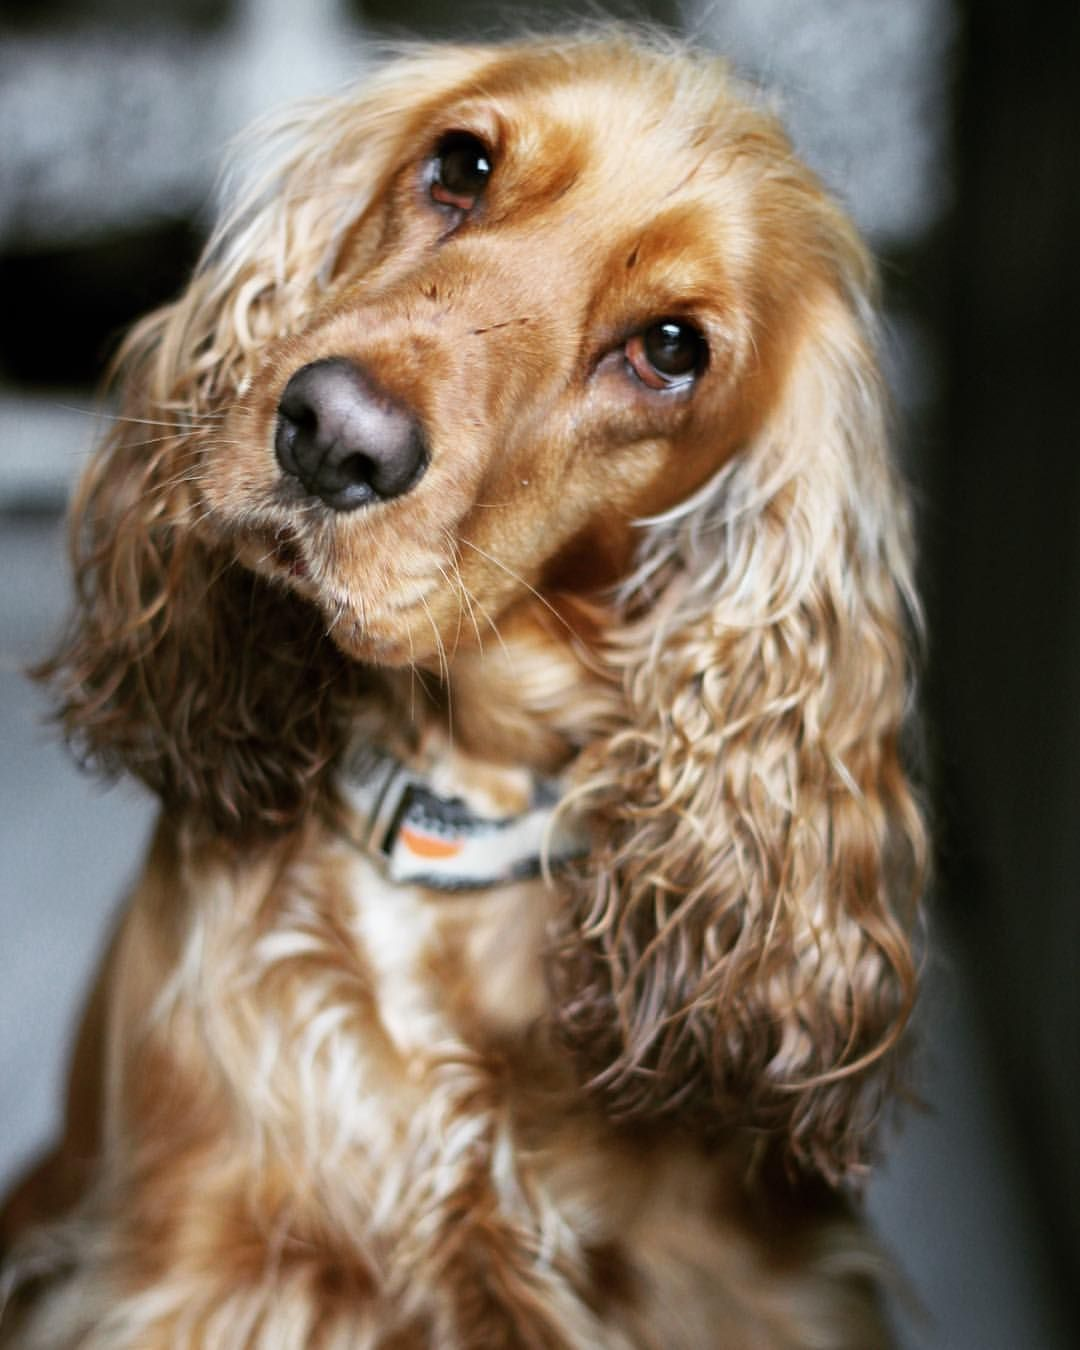 Mi Piace 176 Commenti 10 Prettylittleliv Su Instagram Am I Cute Dog Dogs Dogslove Puppy Puppies Dogsofinstag Dogs Cocker Spaniel Dog Puppies